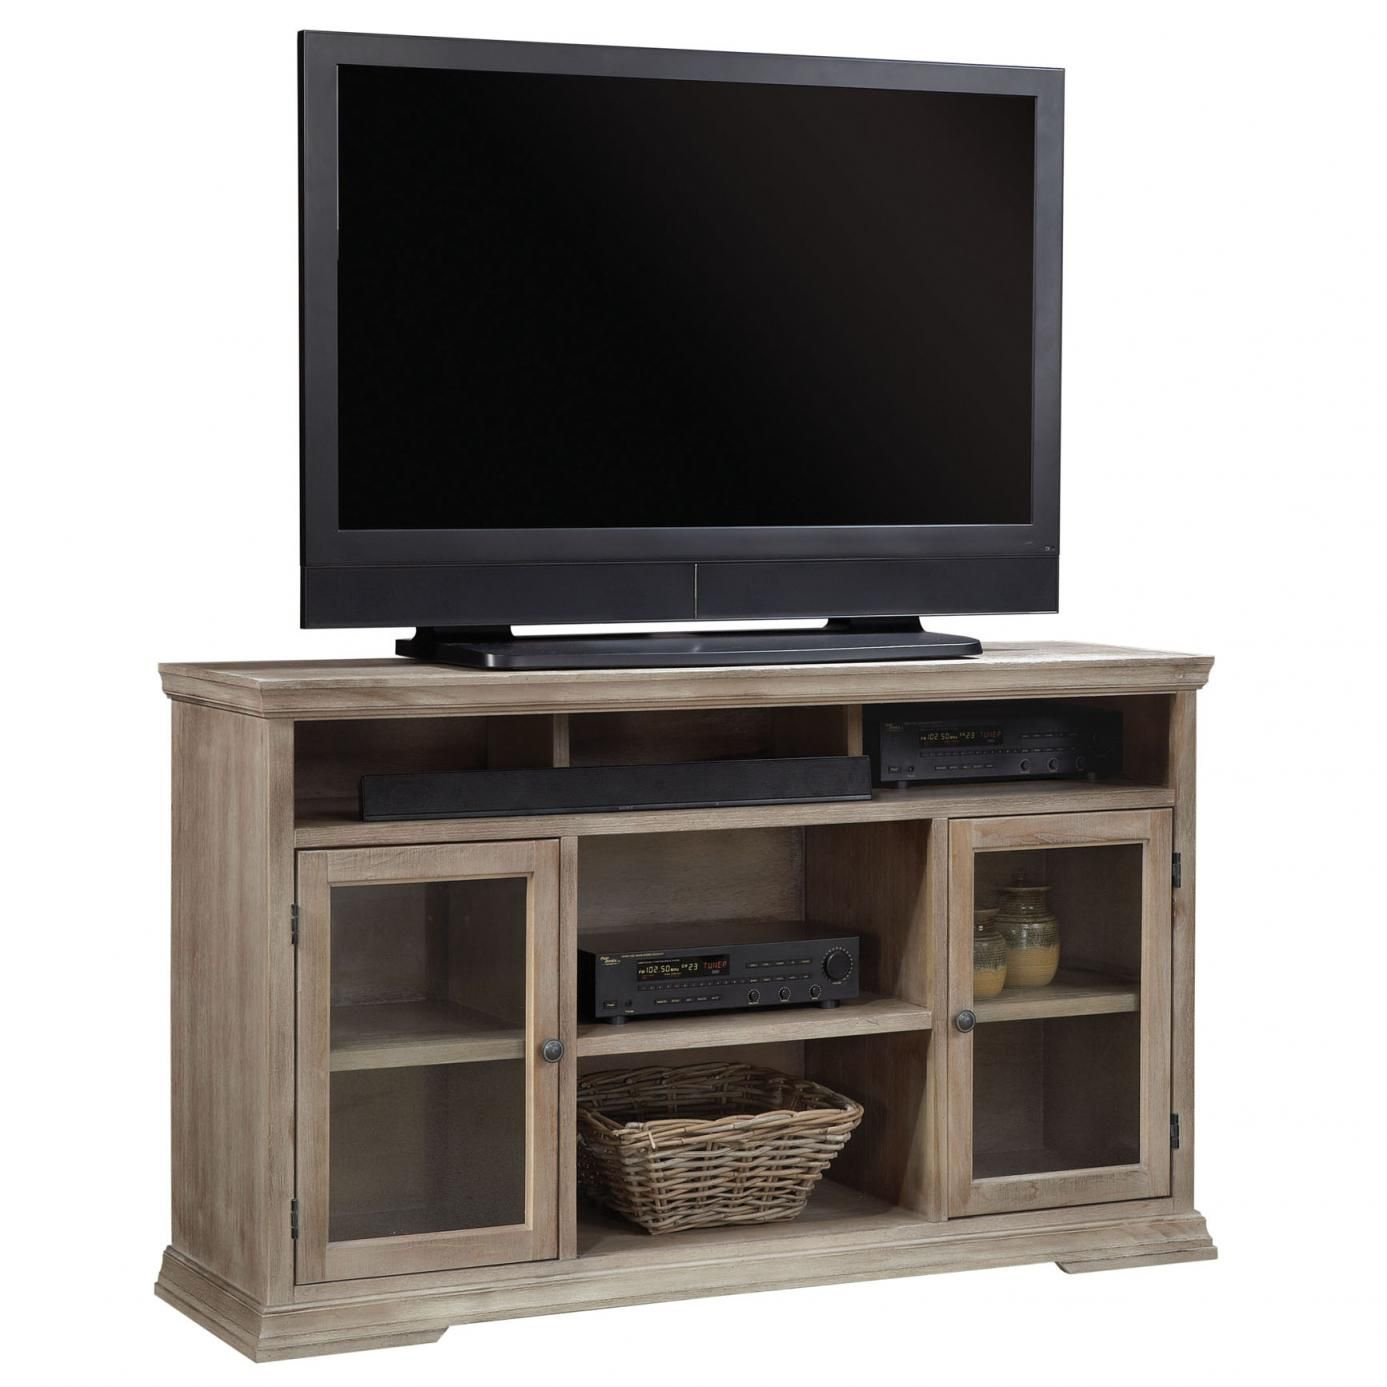 Aspenhome canyon creek inch console furniture u home decor